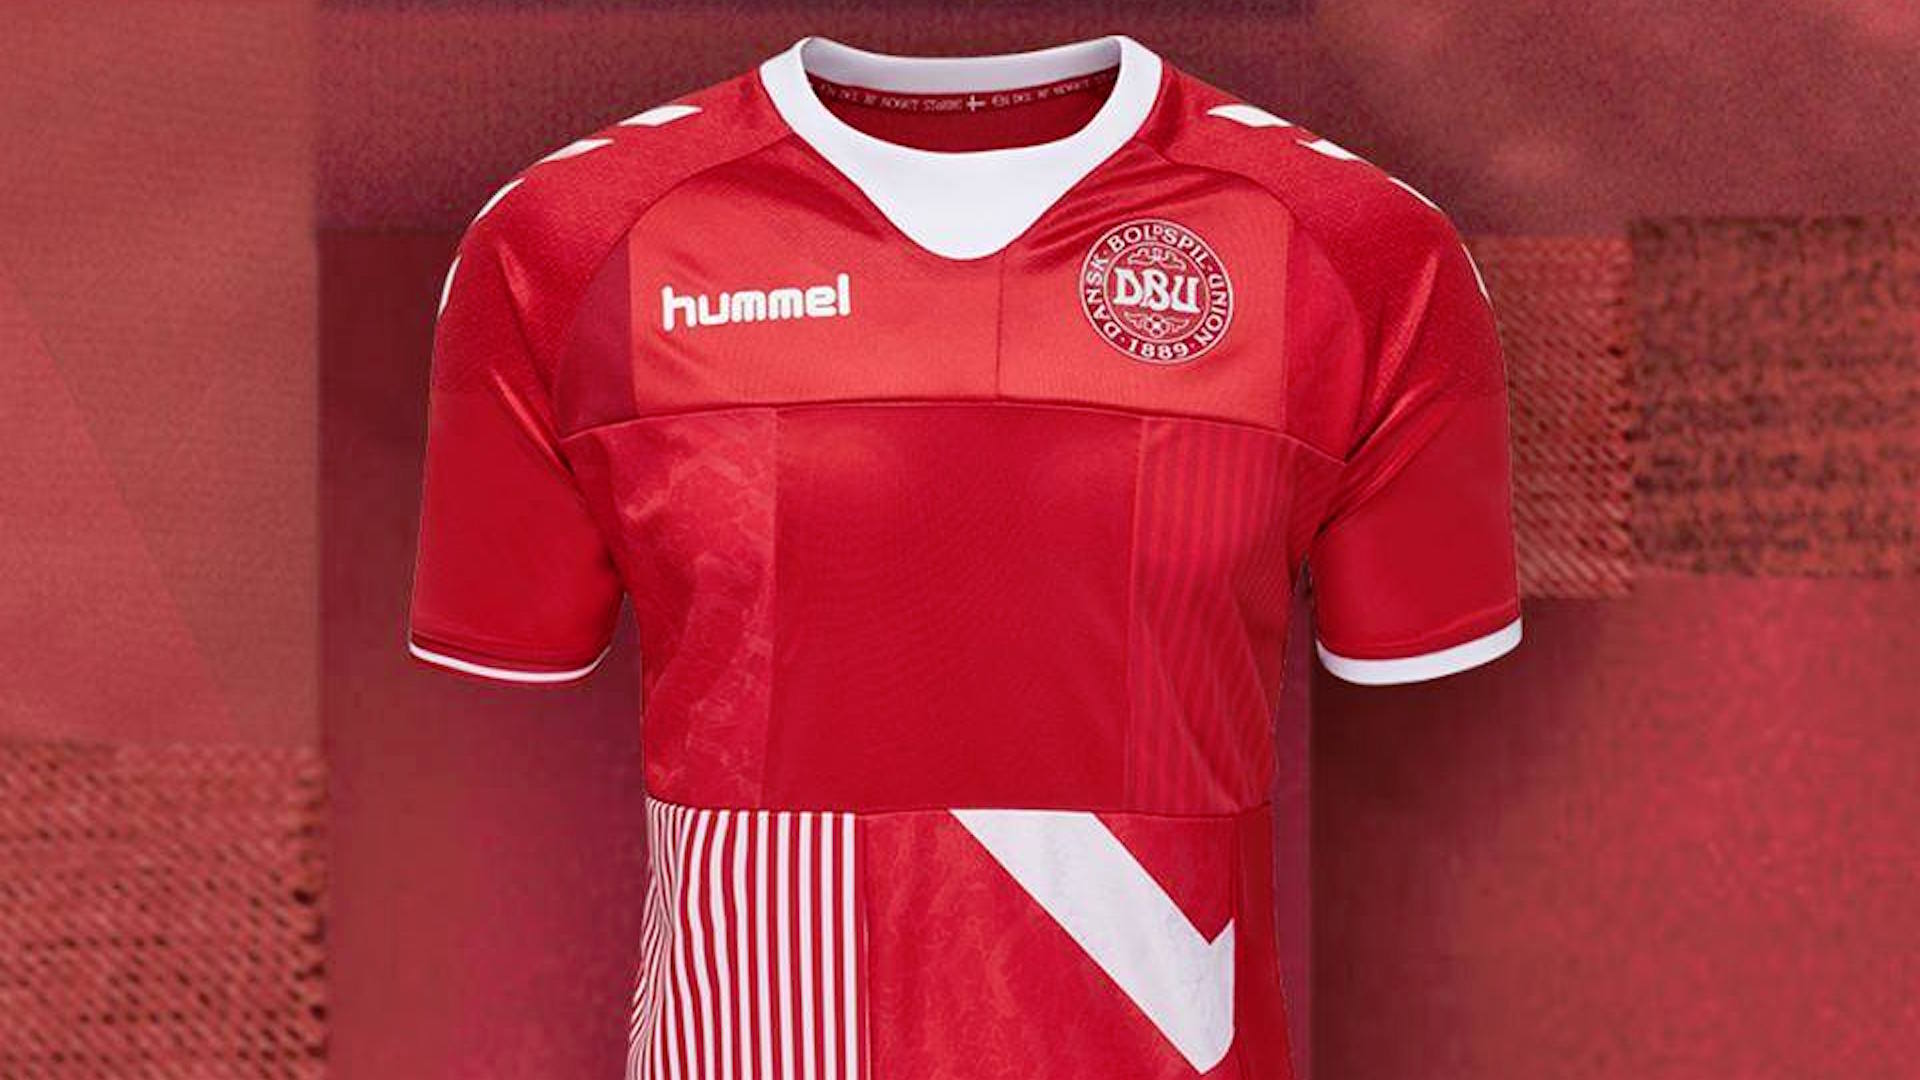 danimarca divisa storica Hummel 2018